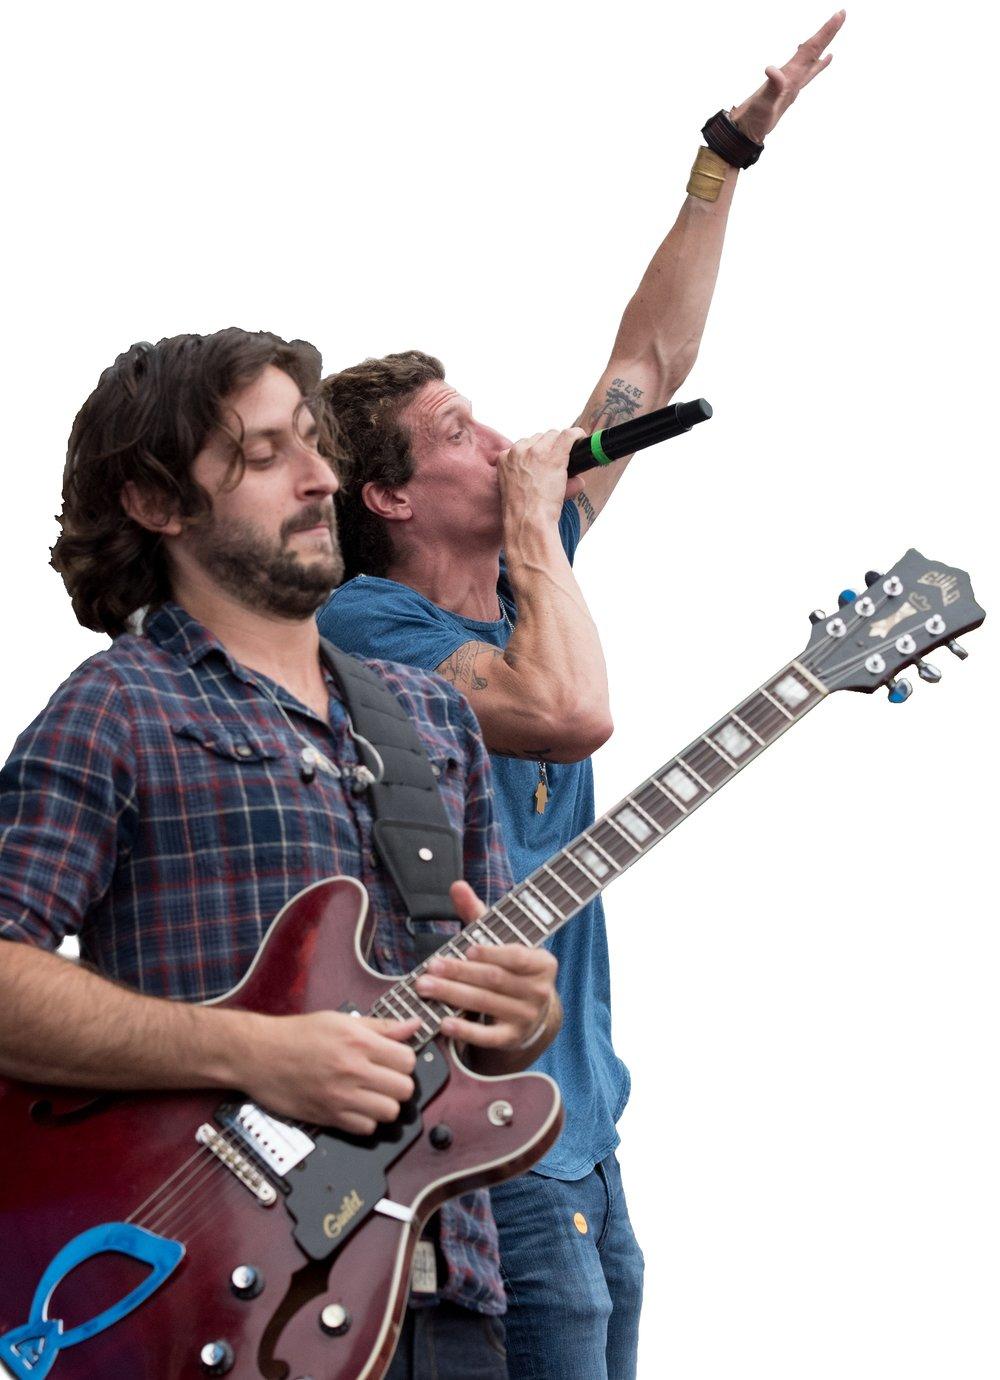 Zack Feinberg and David Shaw of The Revivalists  © 2016 Lynda Shenkman